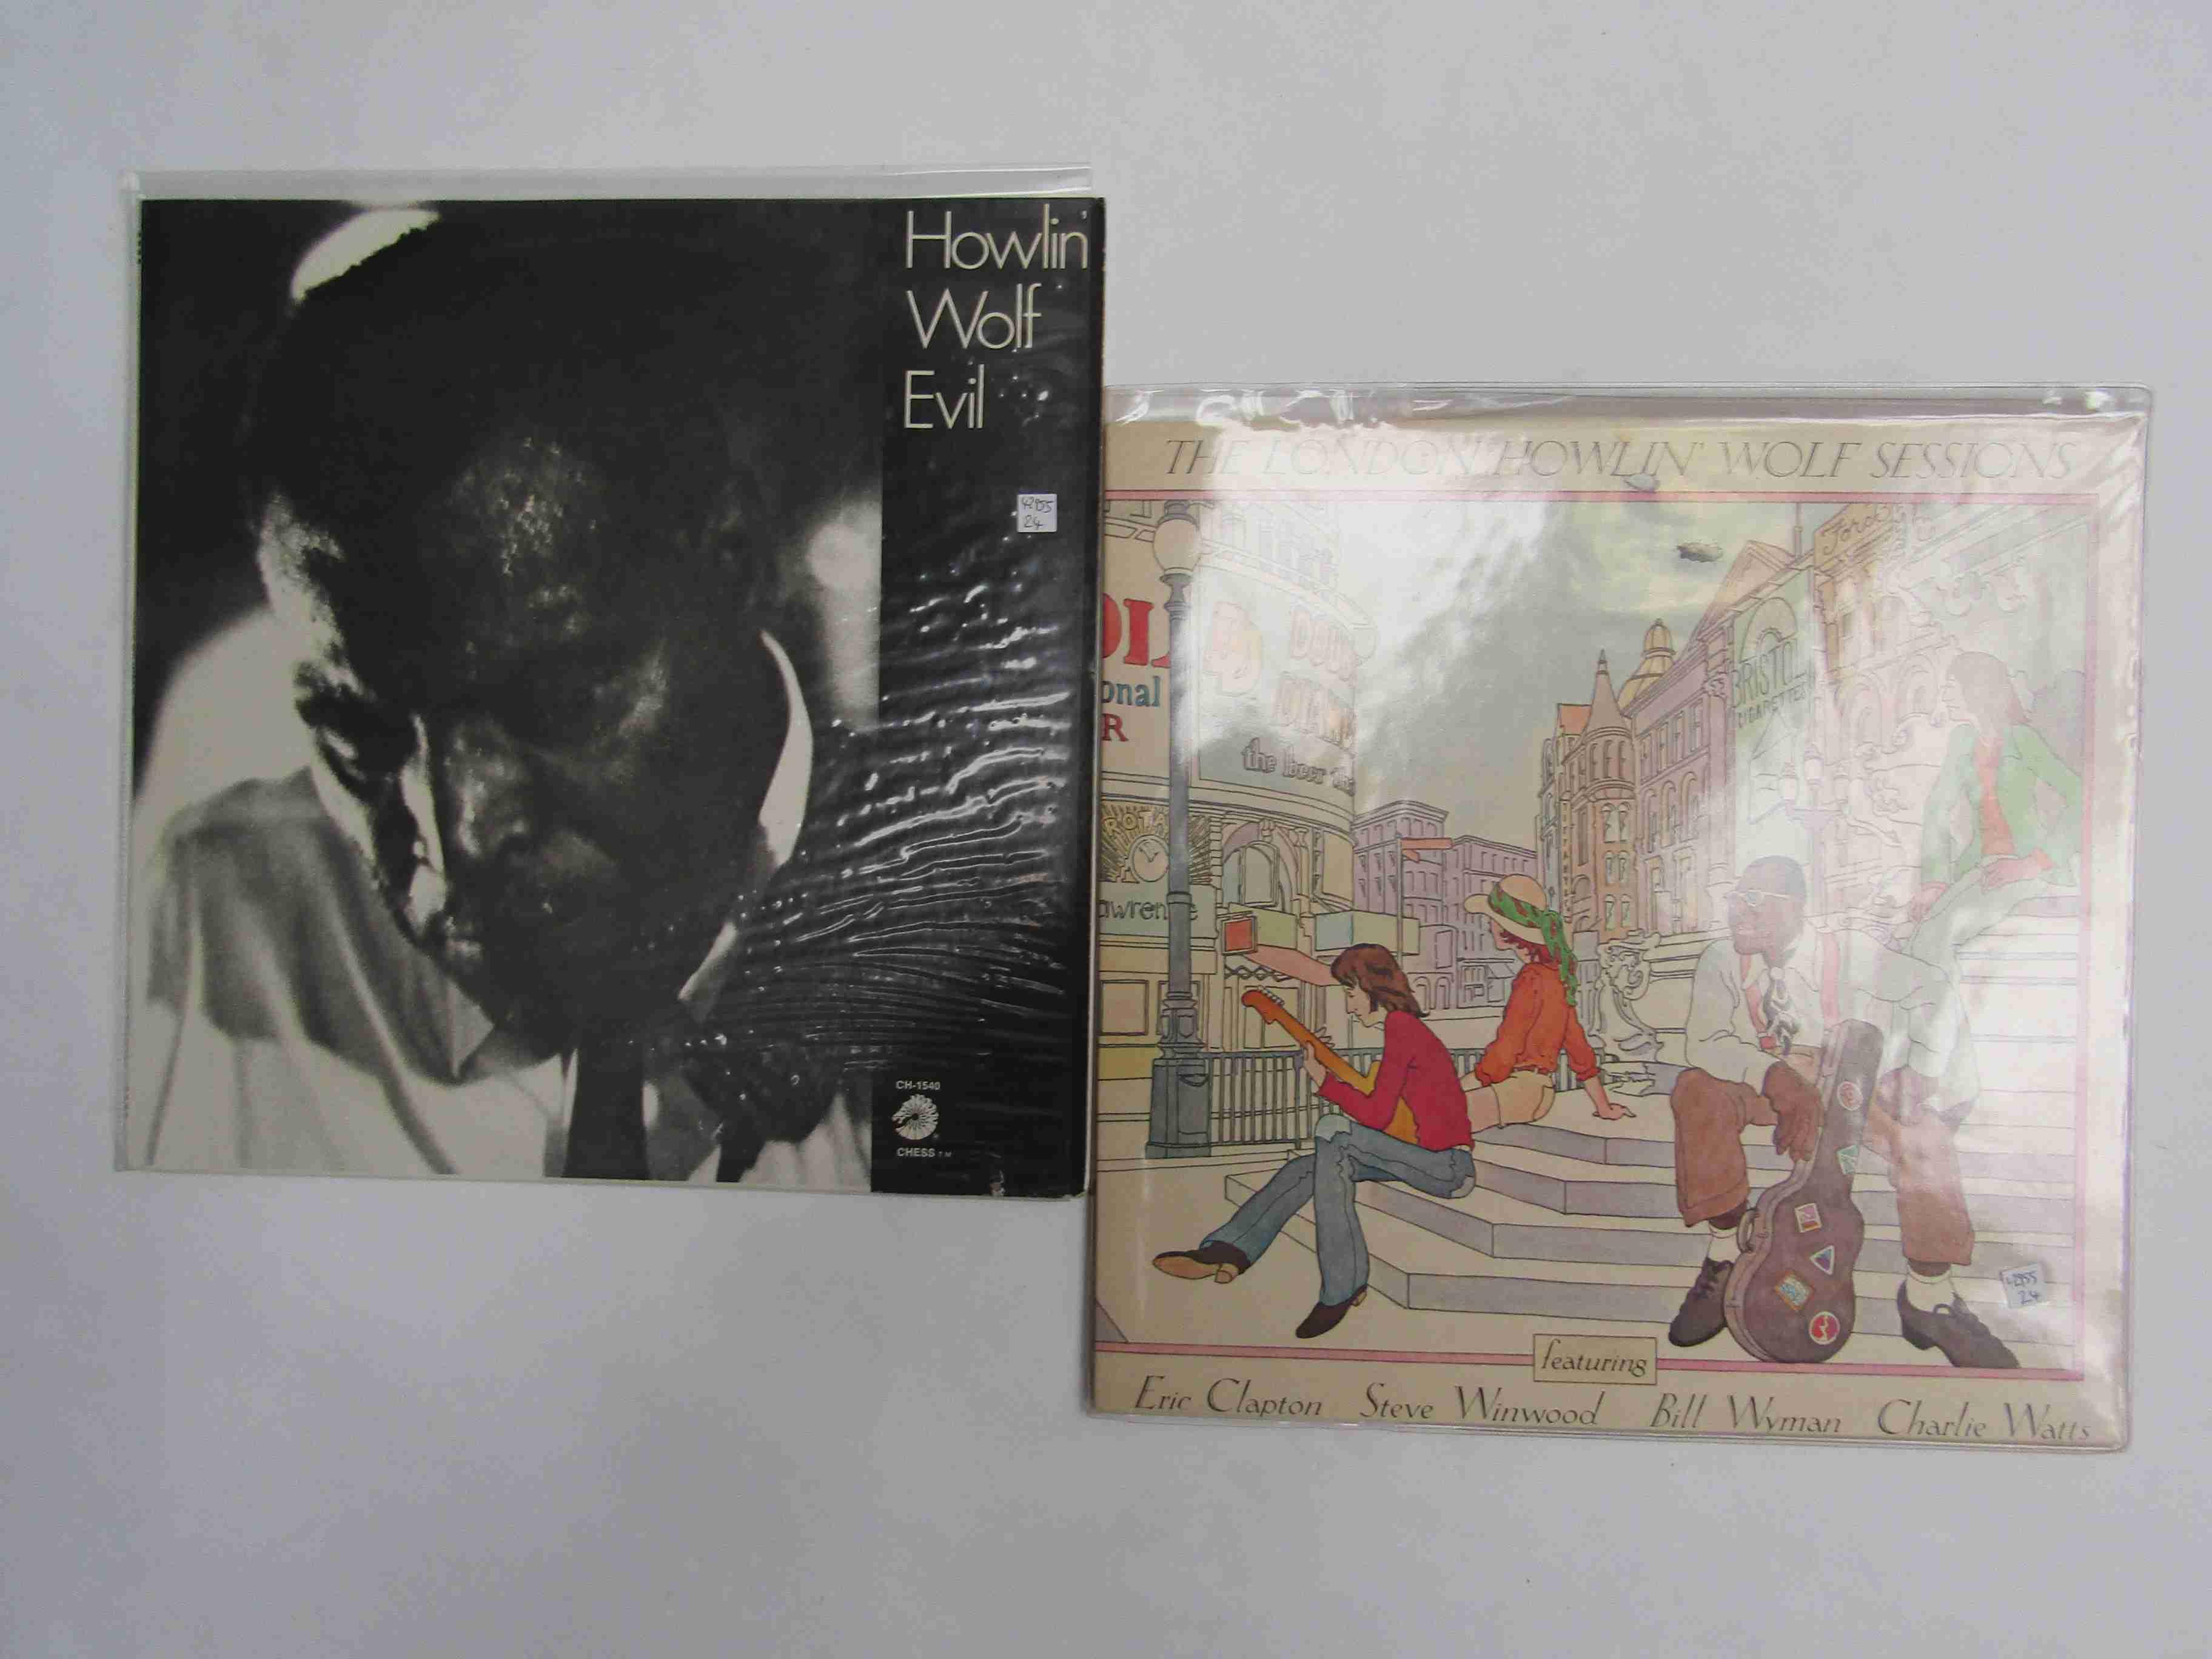 HOWLIN' WOLF: 'Evil' LP, chess Vintage Series CH-1540 (media EX,